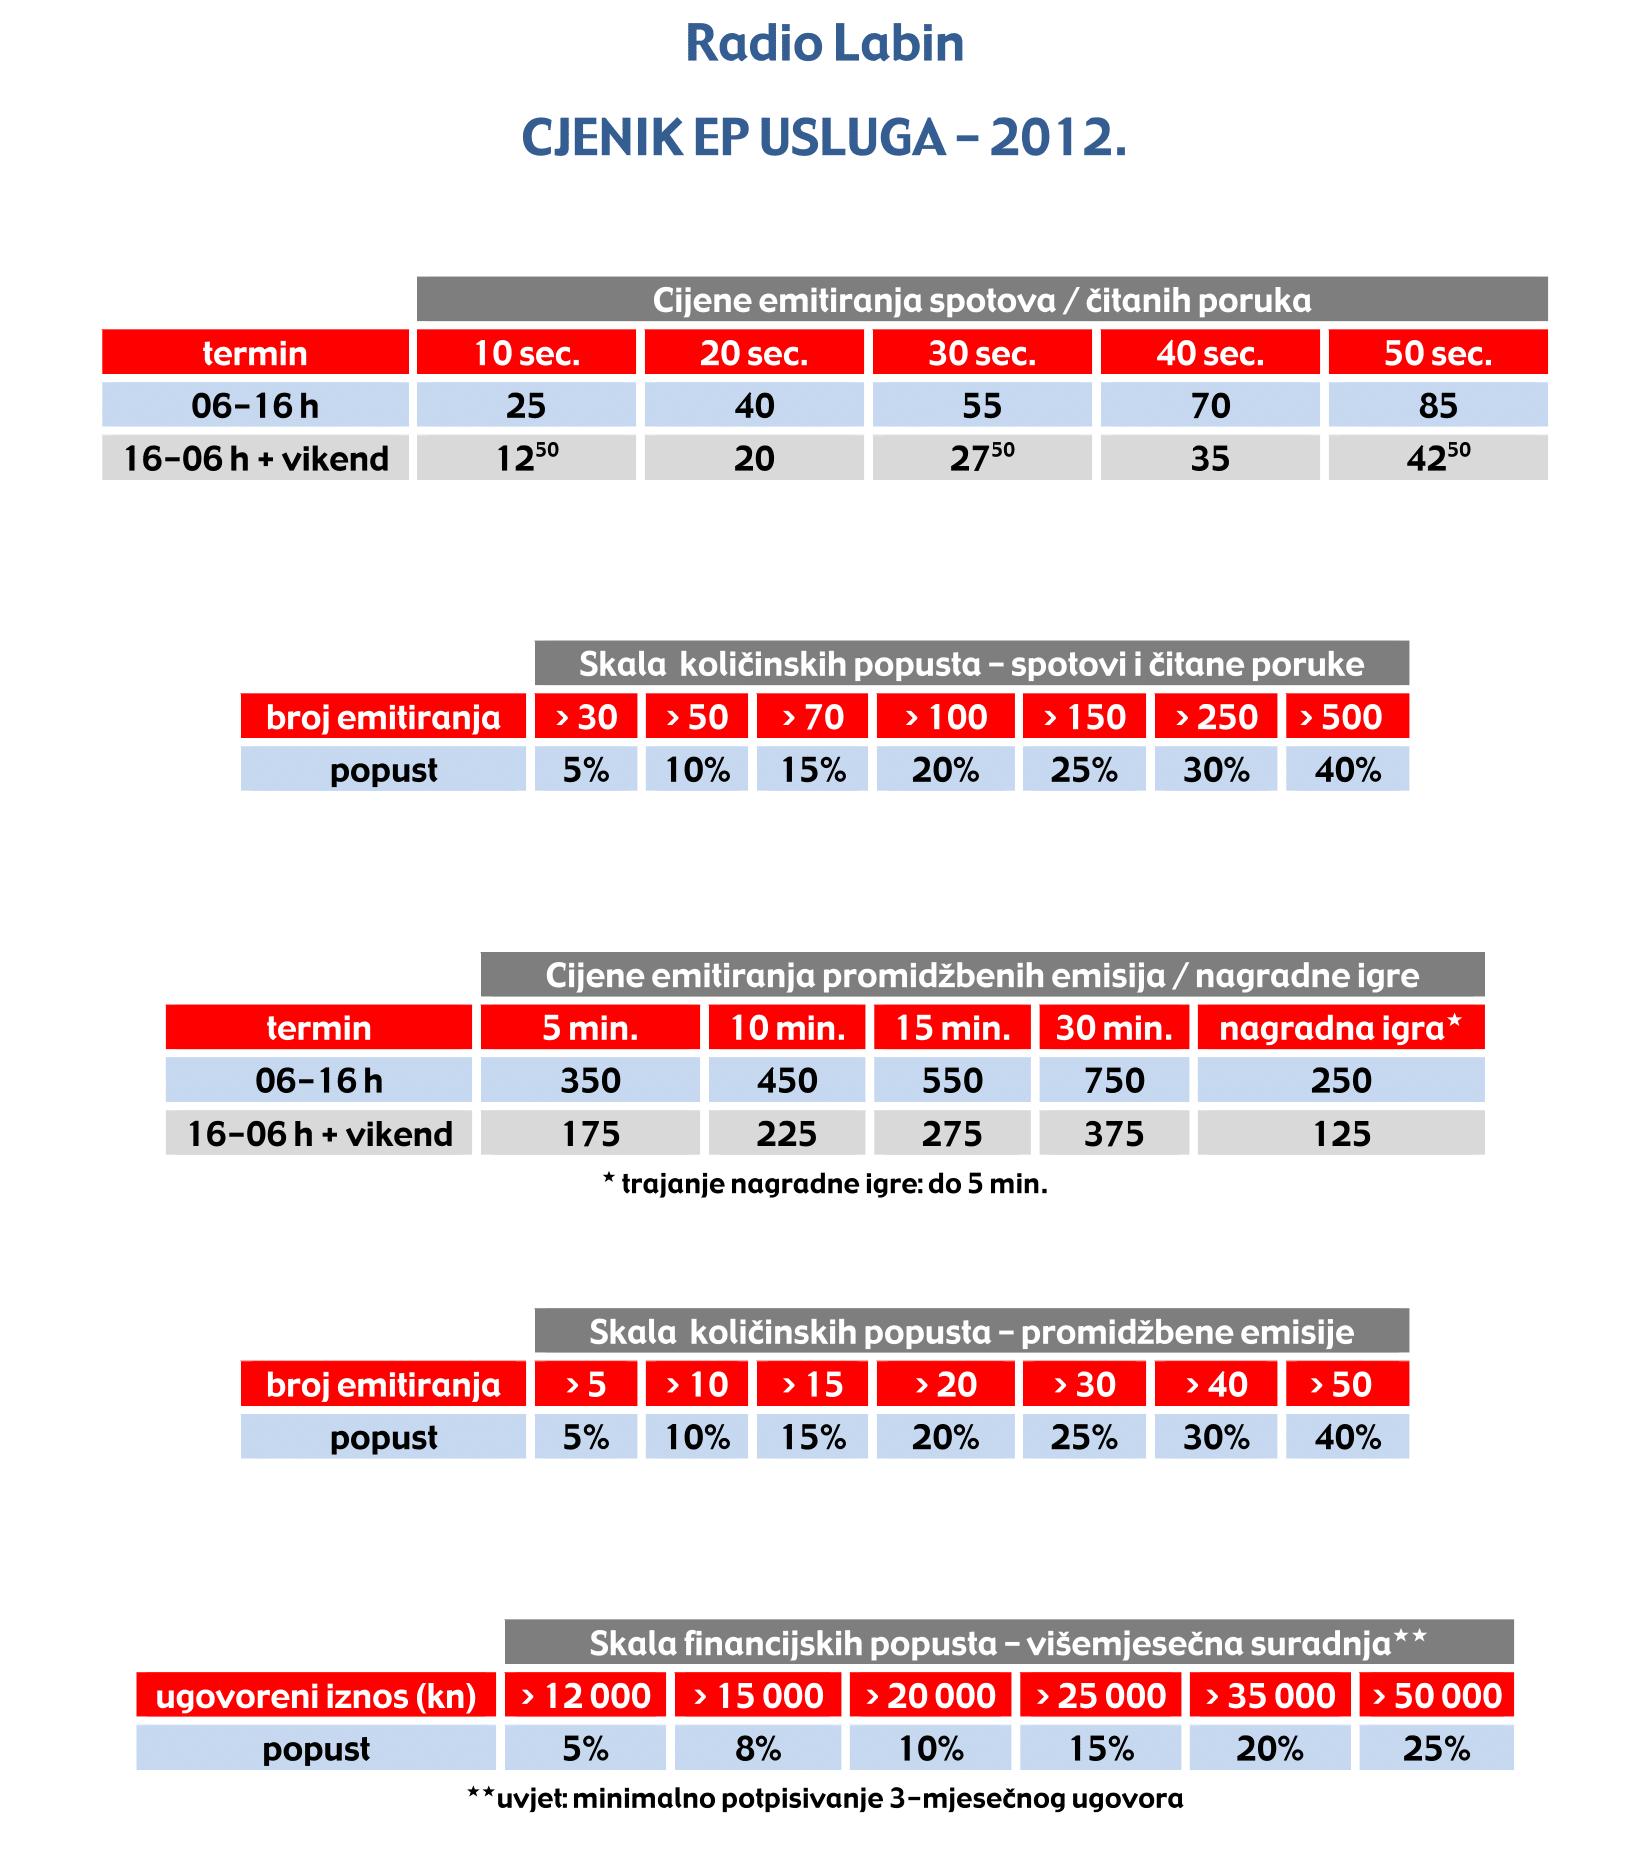 CJENIK EP USLUGA  2012 RL-1